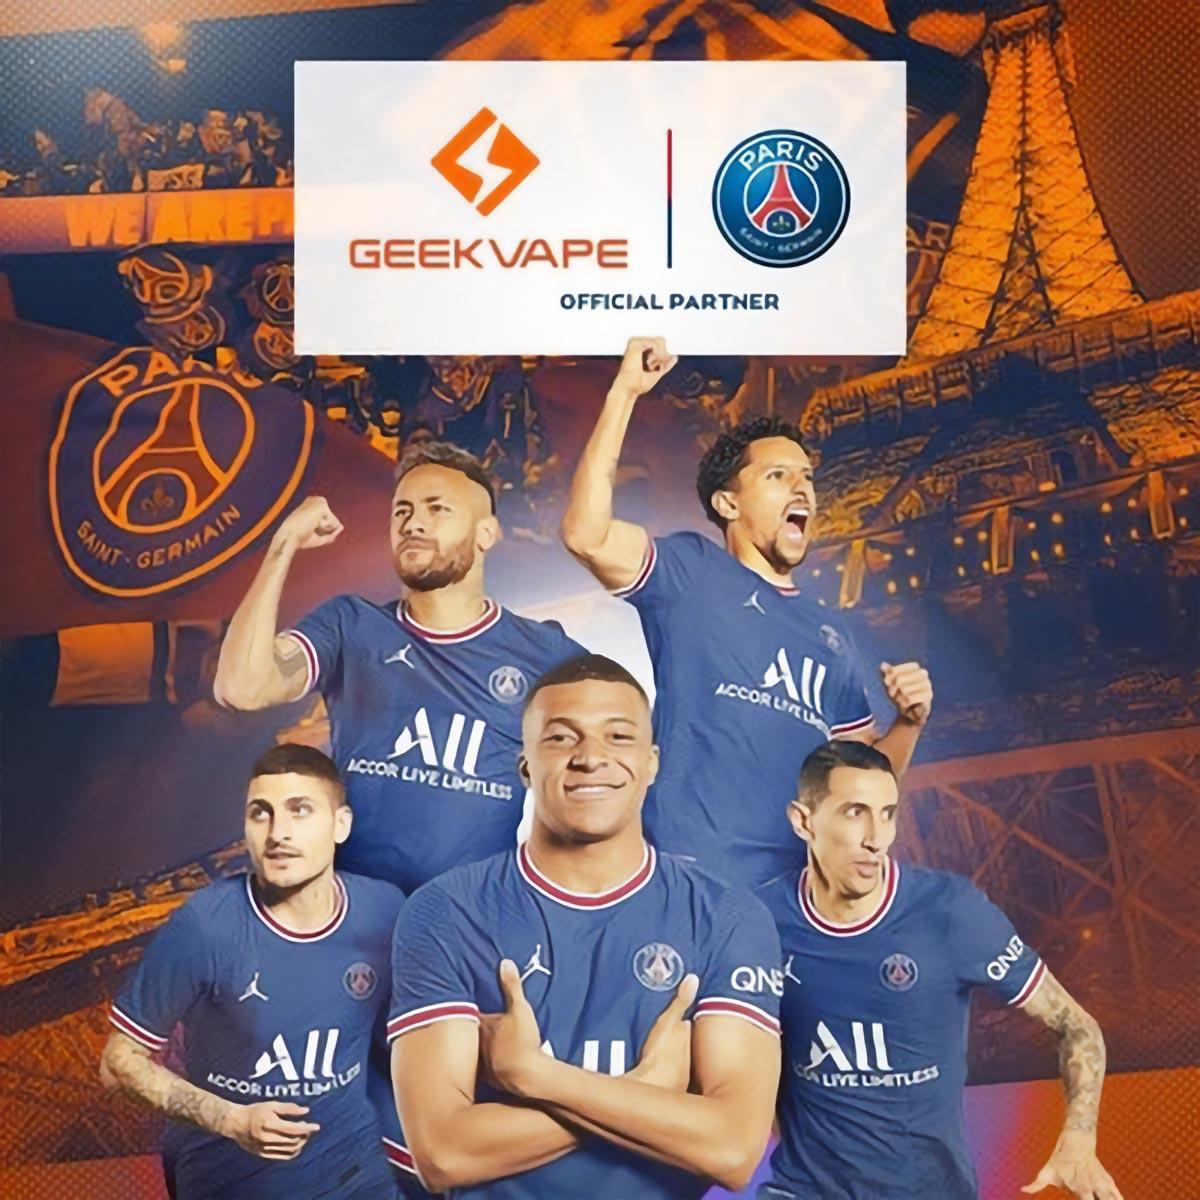 Geekvape-and-Paris-Saint-Germain